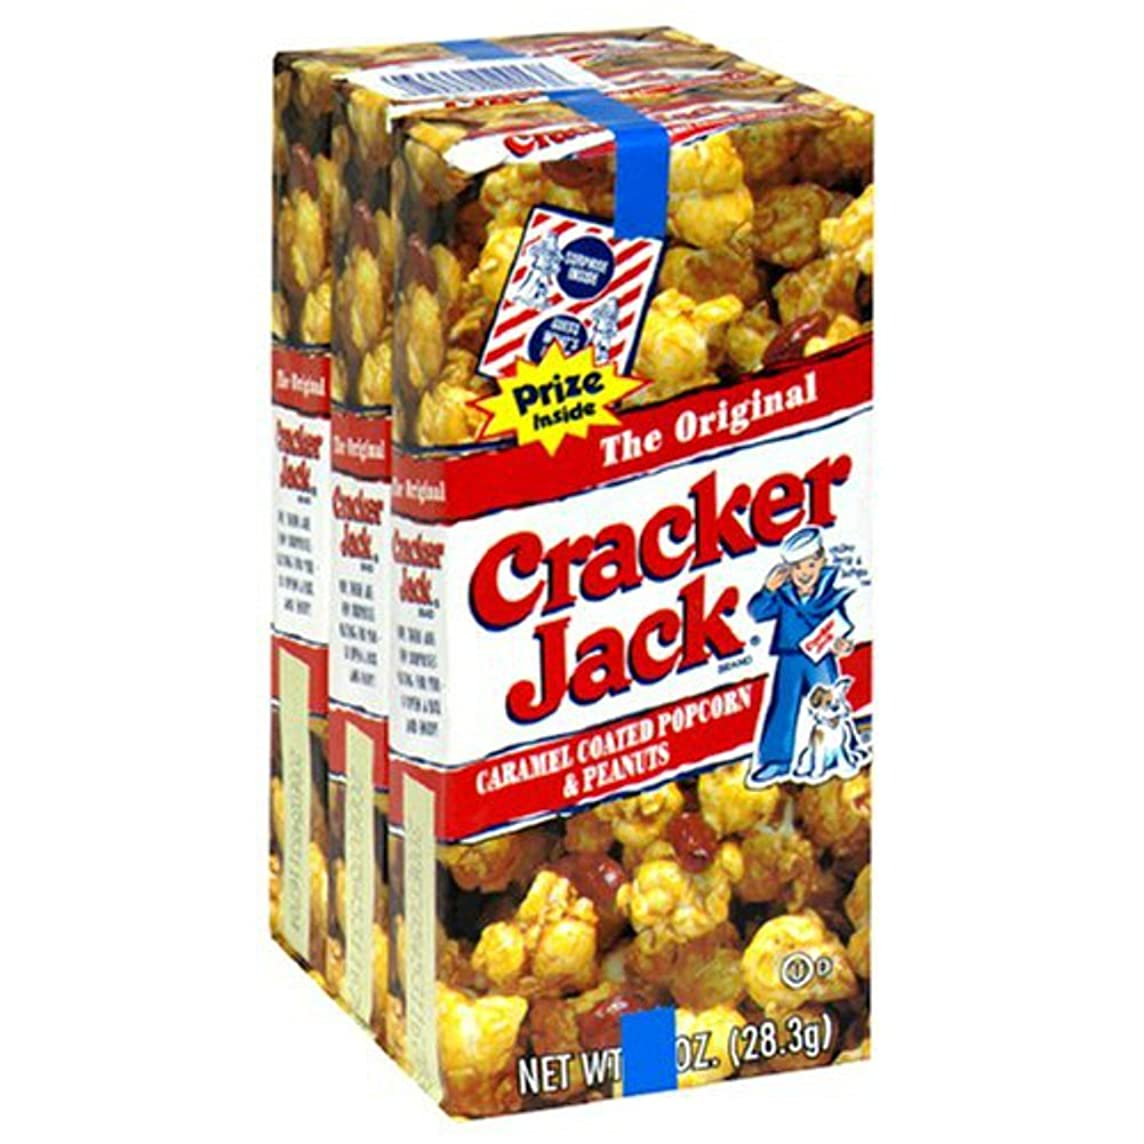 Original Cracker Jack, 3 pack